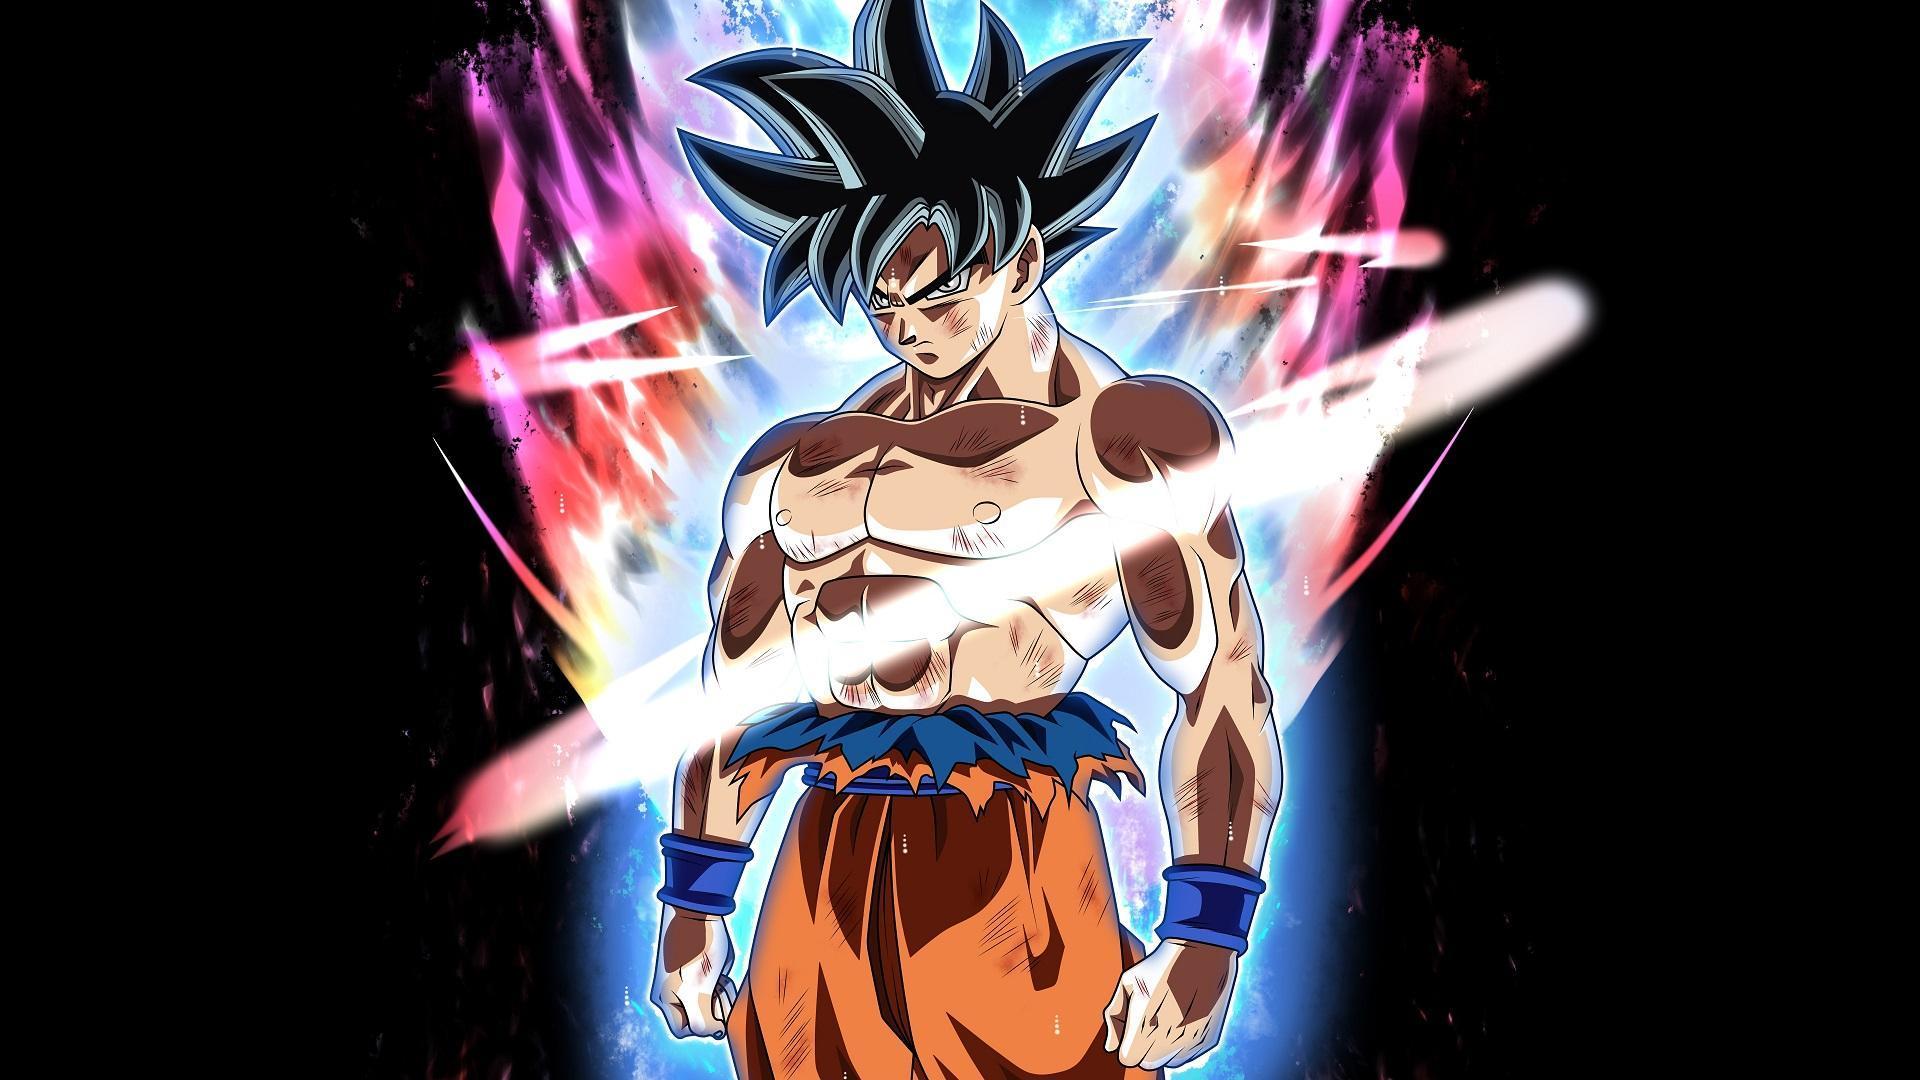 Goku Fond D écran Hd Goku Dragonball Fond D écran Pour